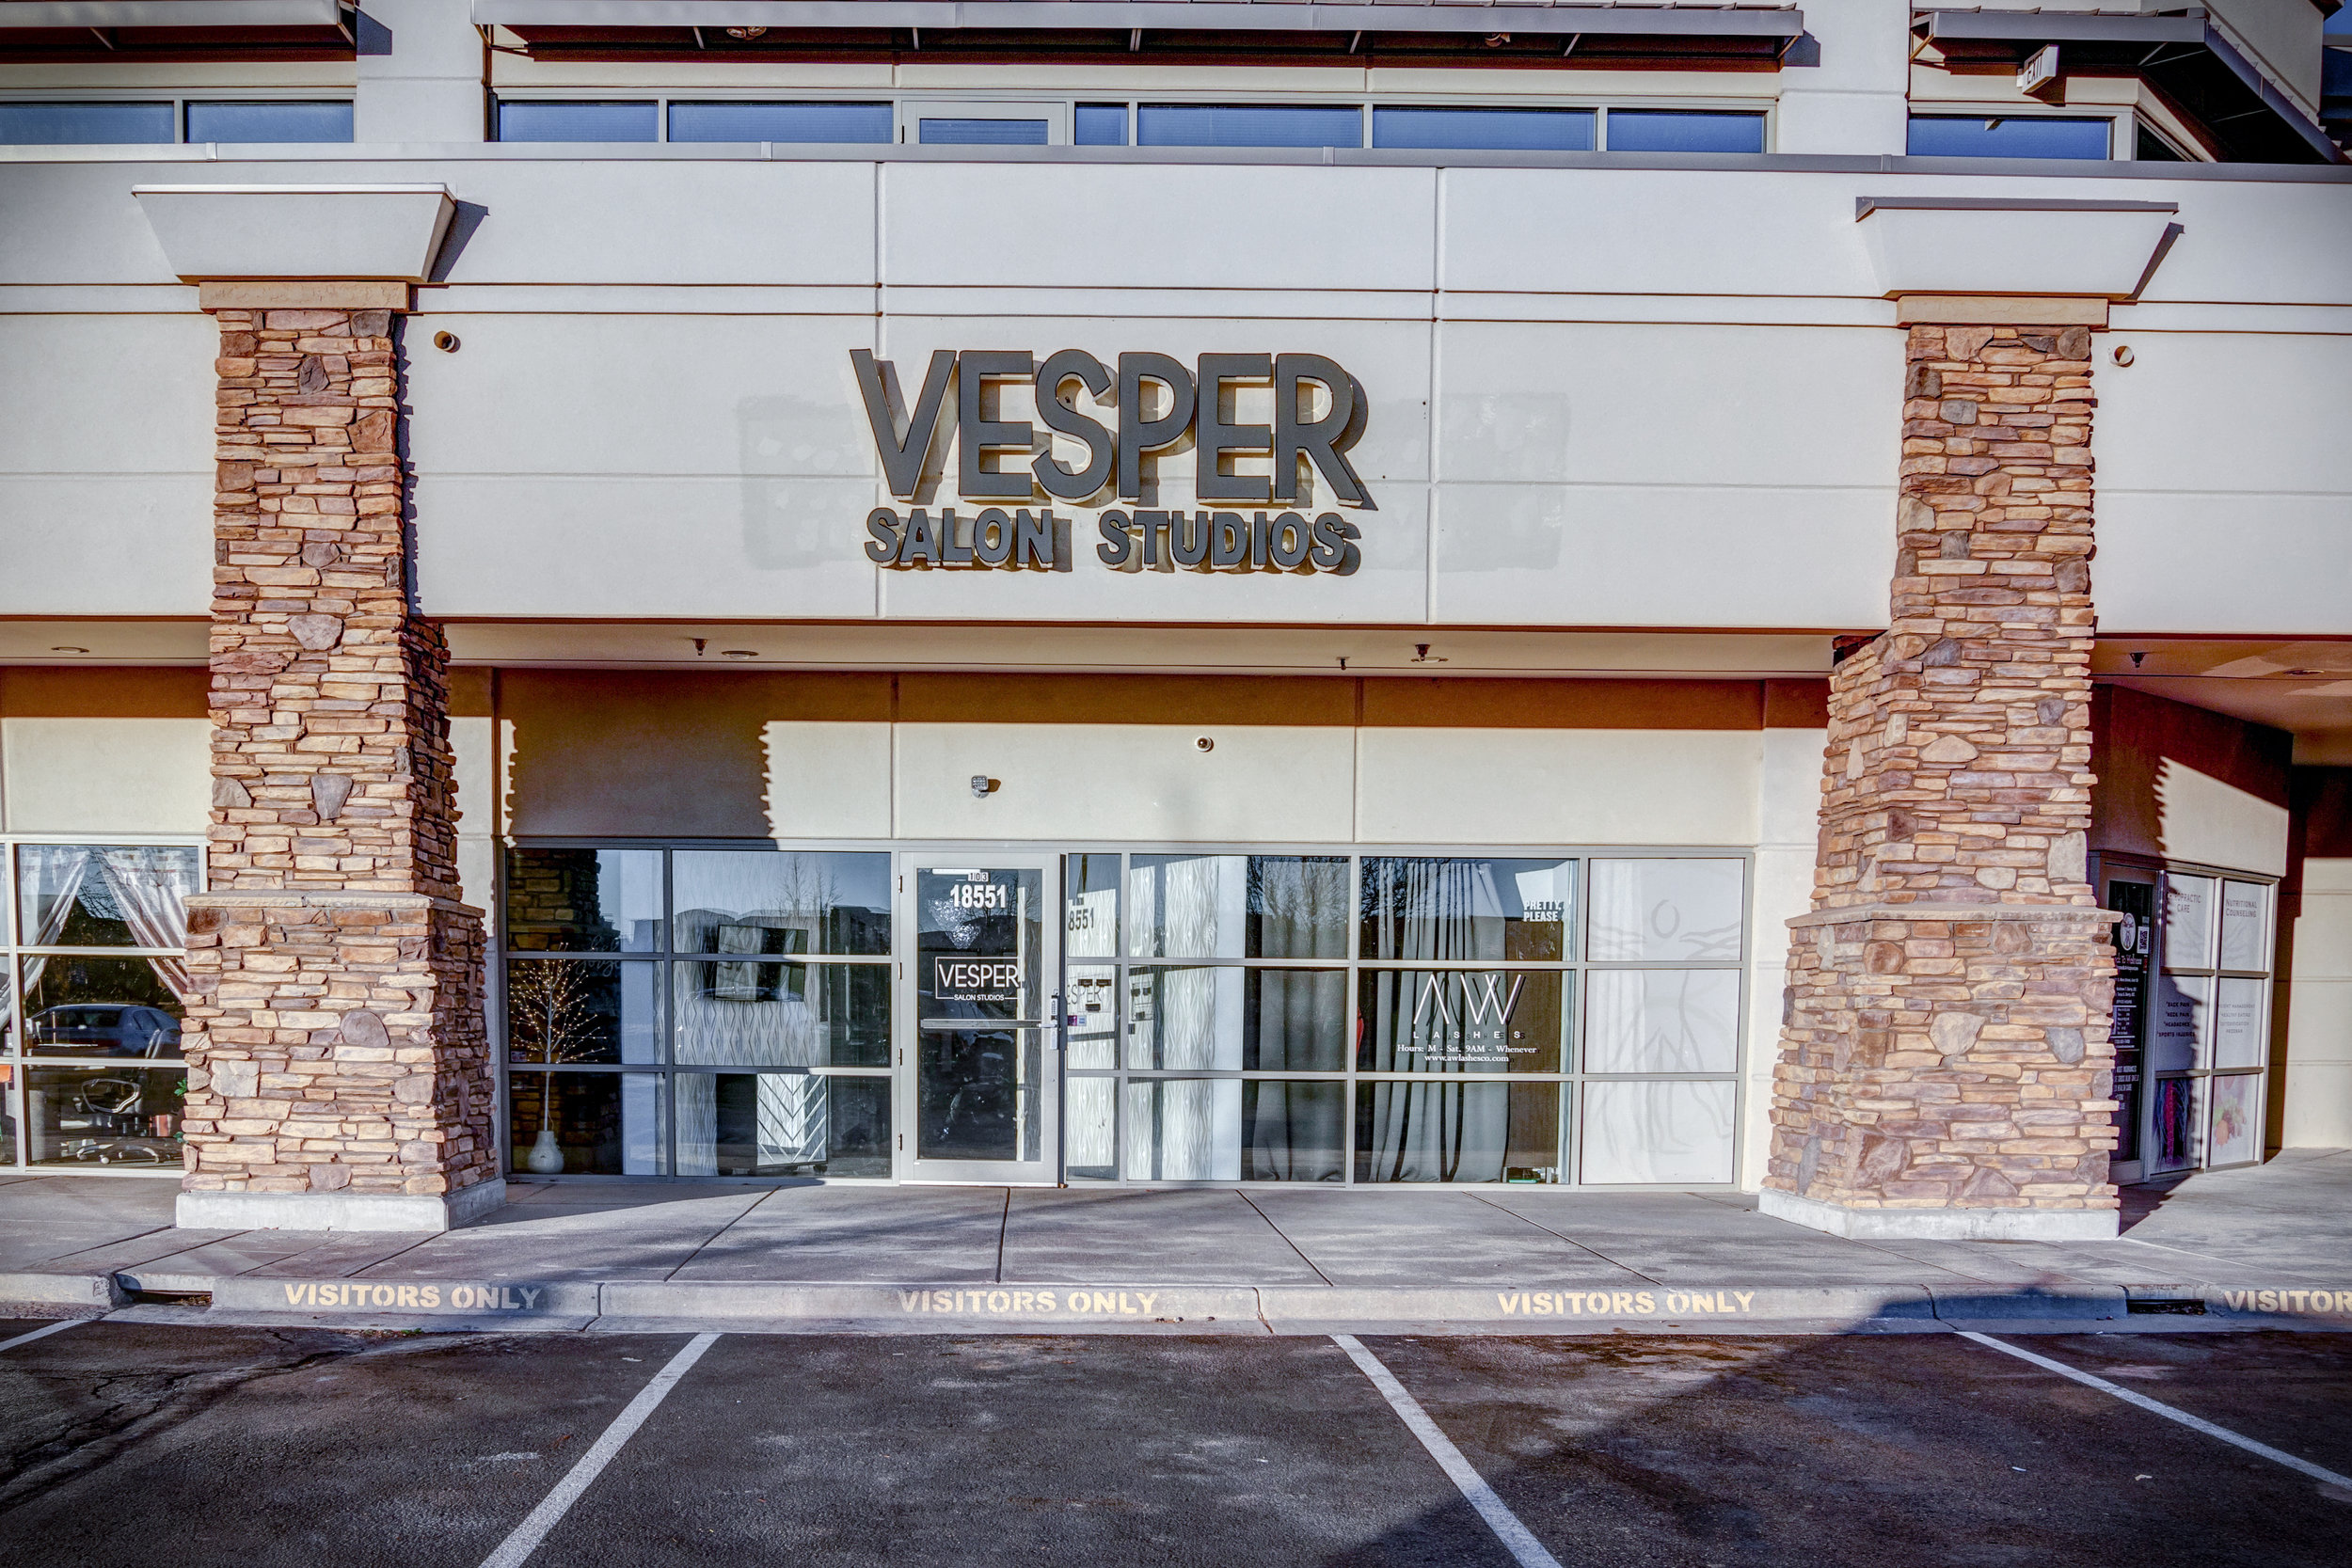 Vesper Salon Services_01.JPG